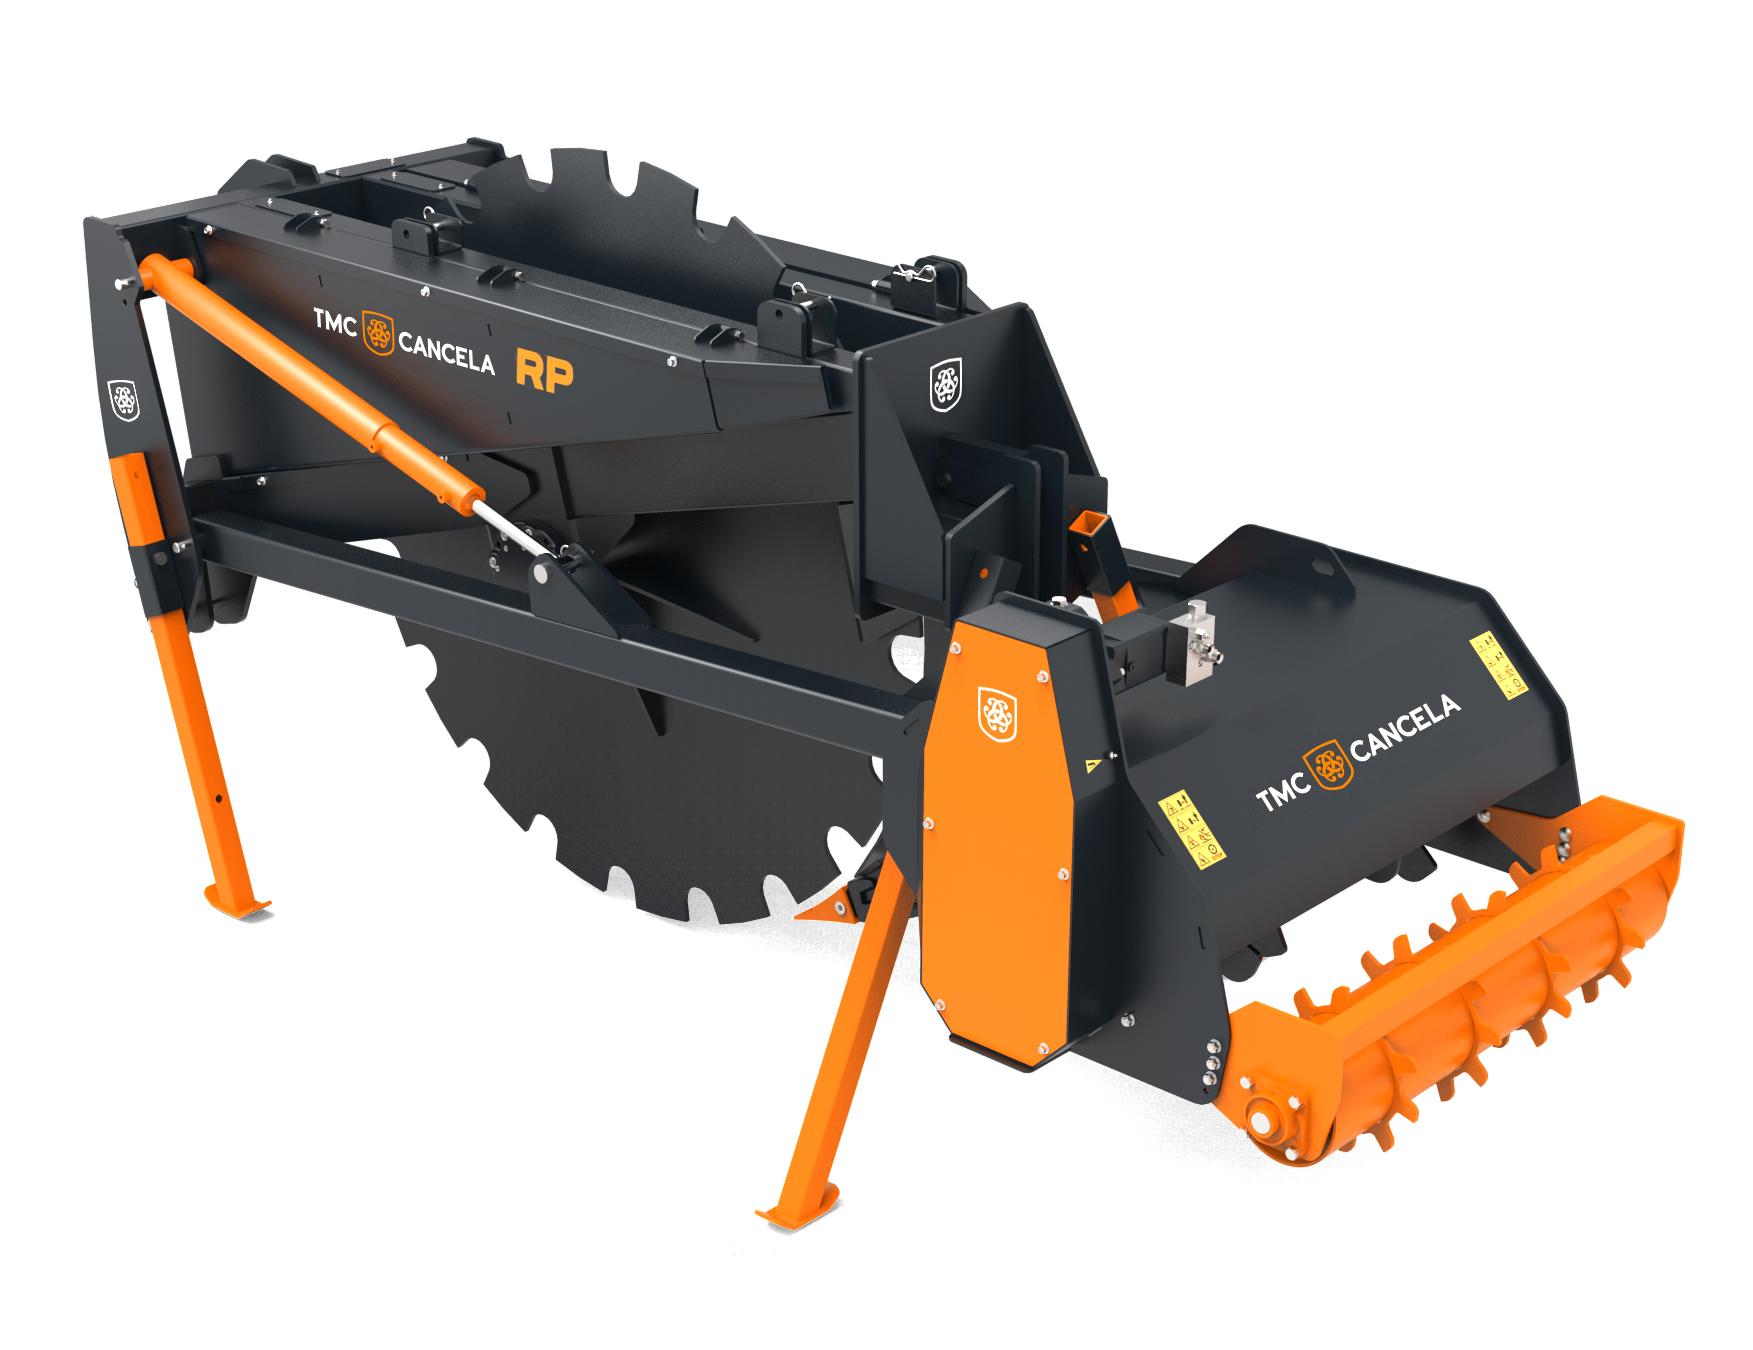 RP 01 Trinciatrice Trincia Trituradora Triturador Forestal Foresta Forestale